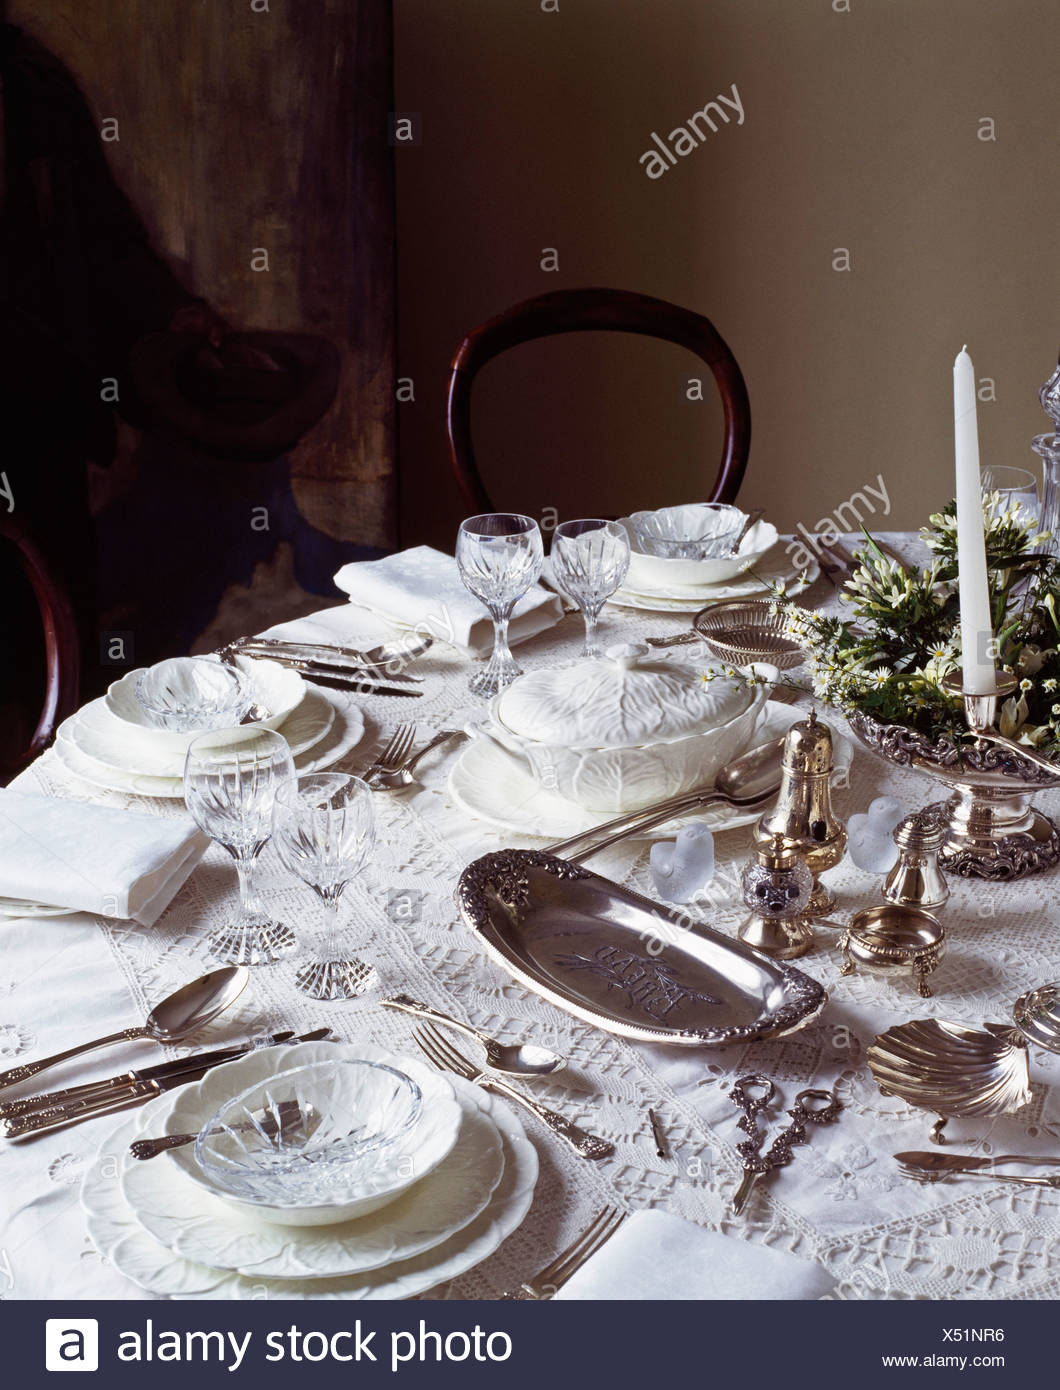 Silver Dinner Table Setting - Stock Image & Posh Dinner Table Setting Stock Photos \u0026 Posh Dinner Table Setting ...